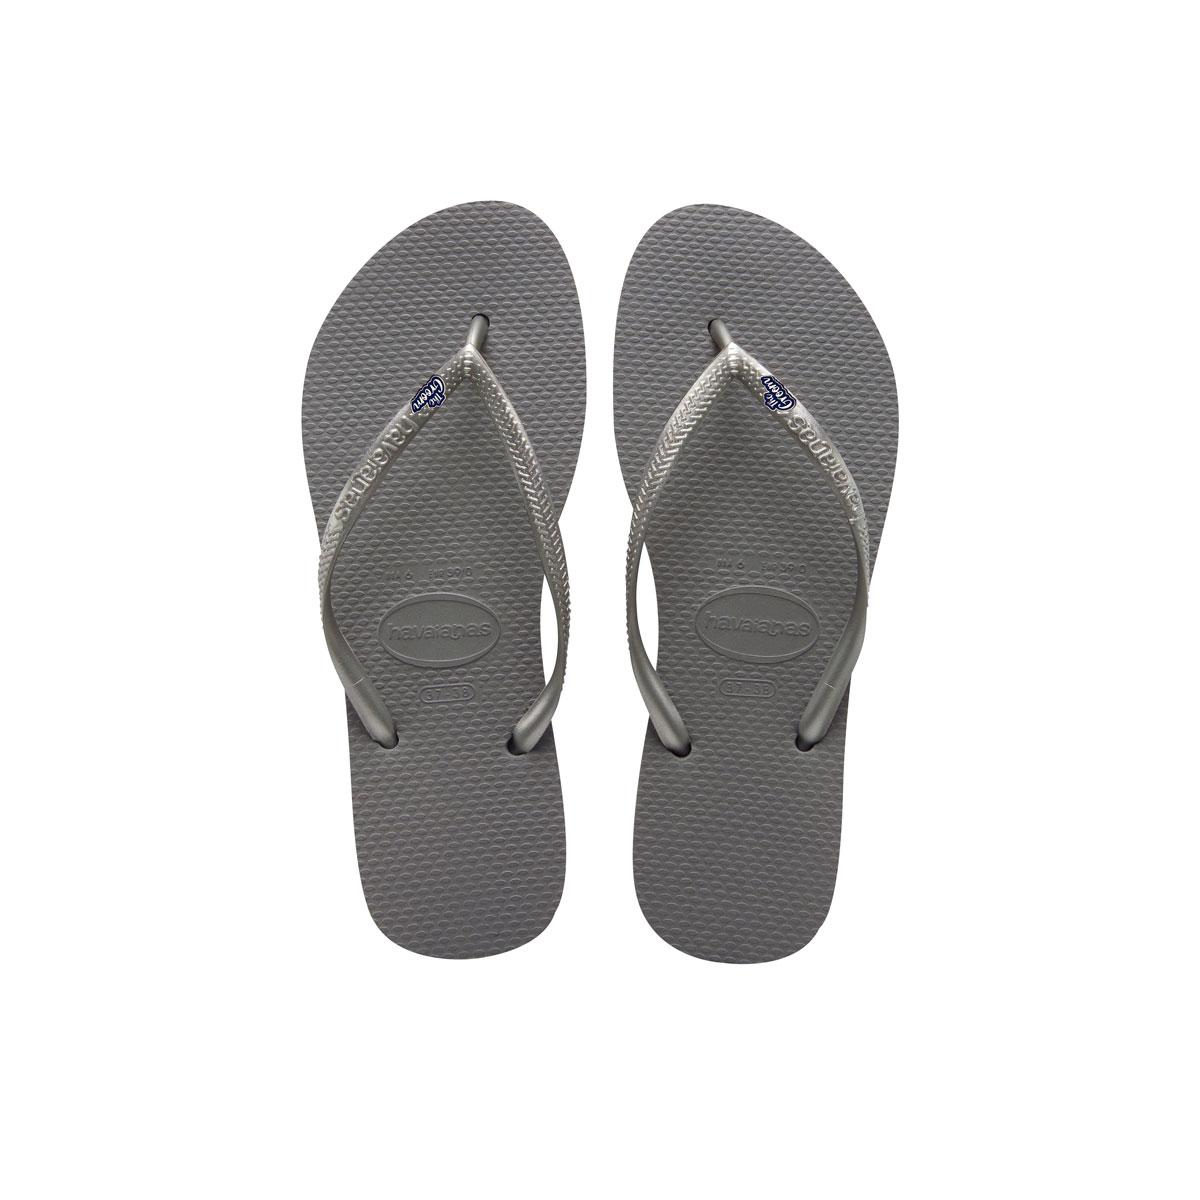 Havaianas Silver Slim Flip Flops with The Groom Silver Wedding Charm